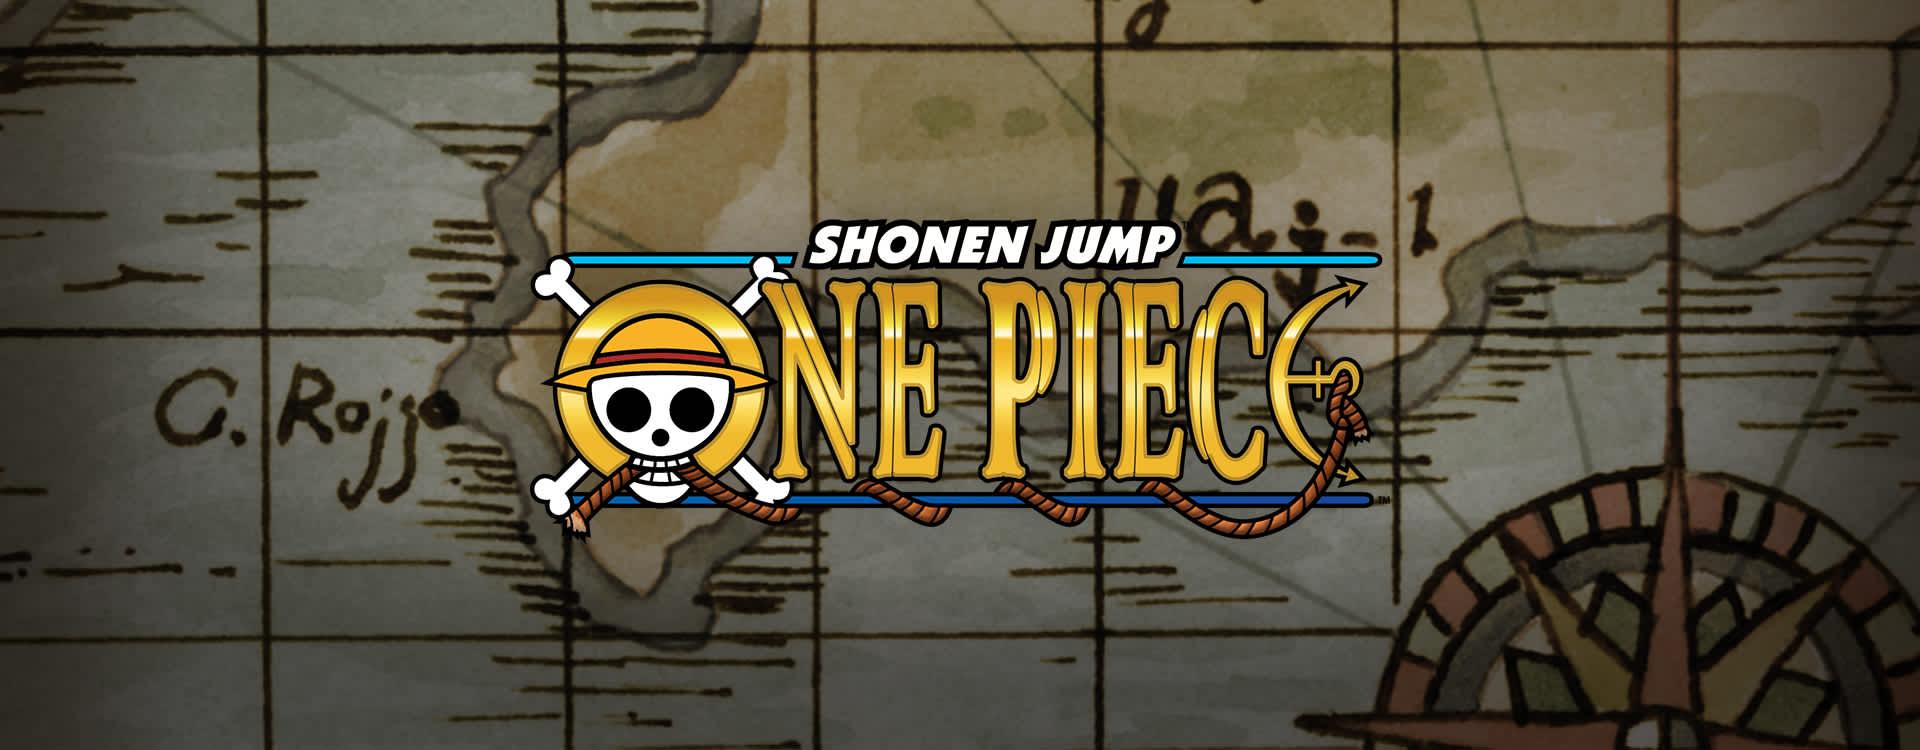 Watch One Piece Episodes Sub & Dub | Action/Adventure